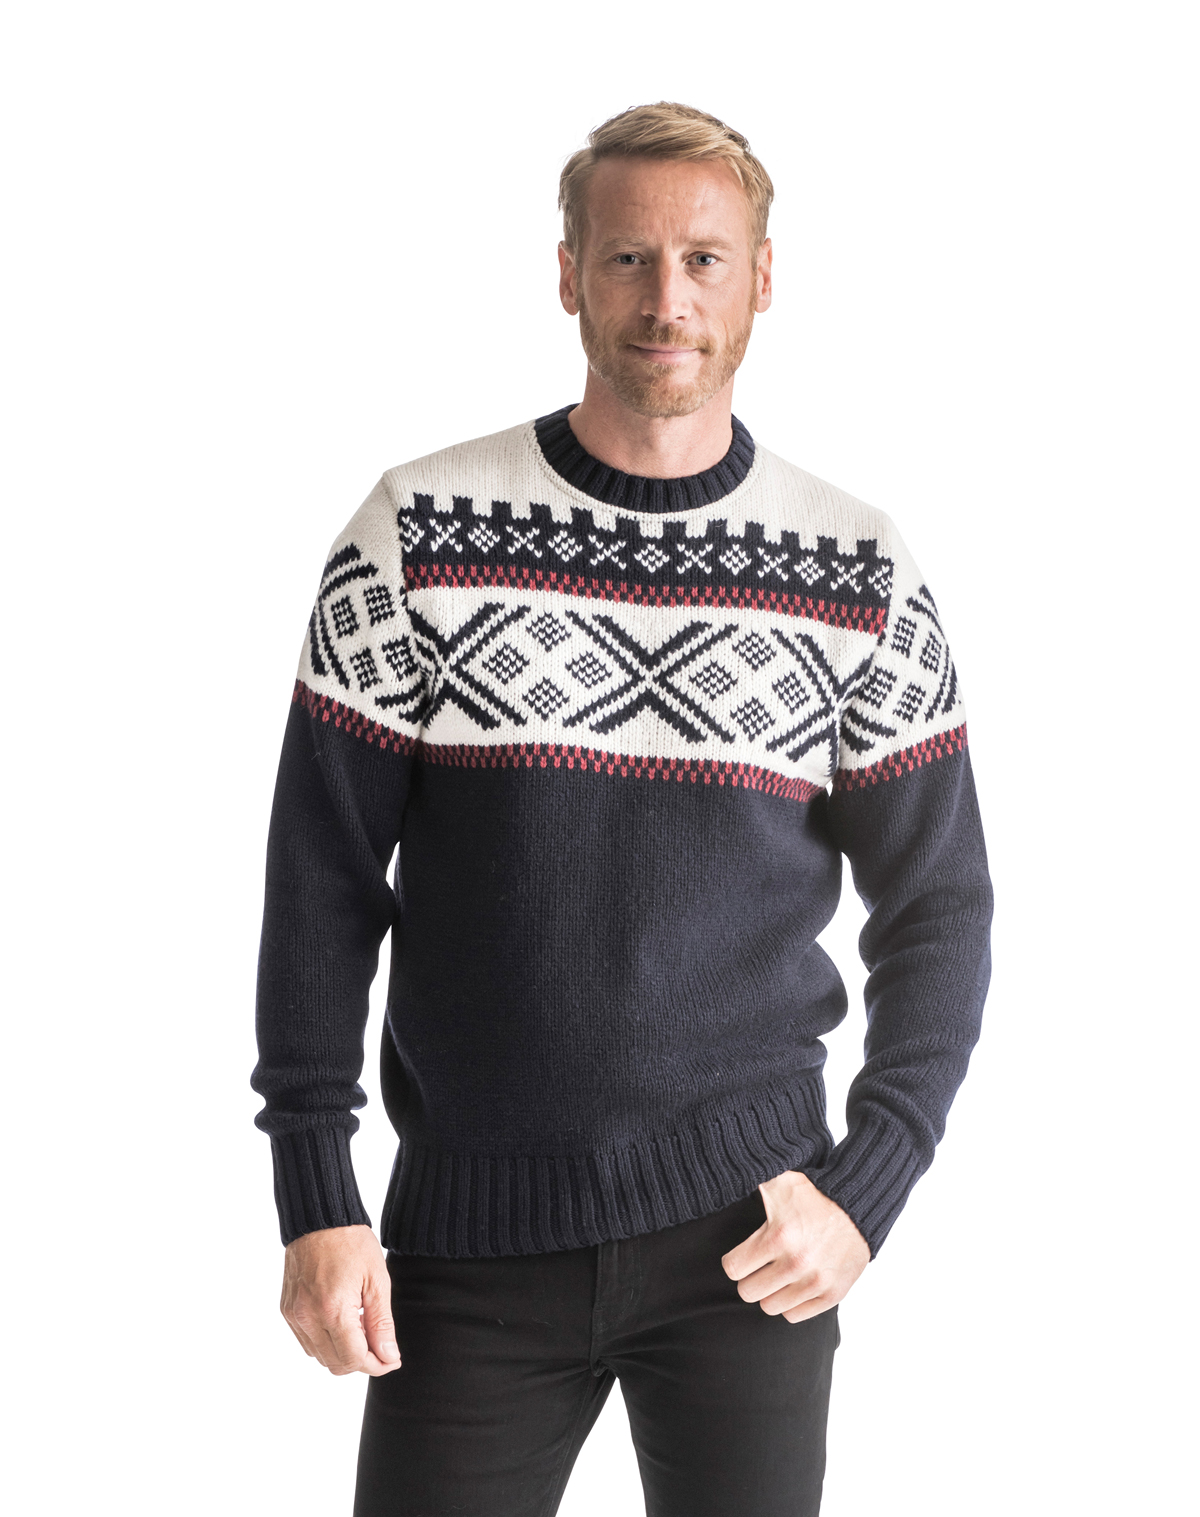 Skigard men's sweater